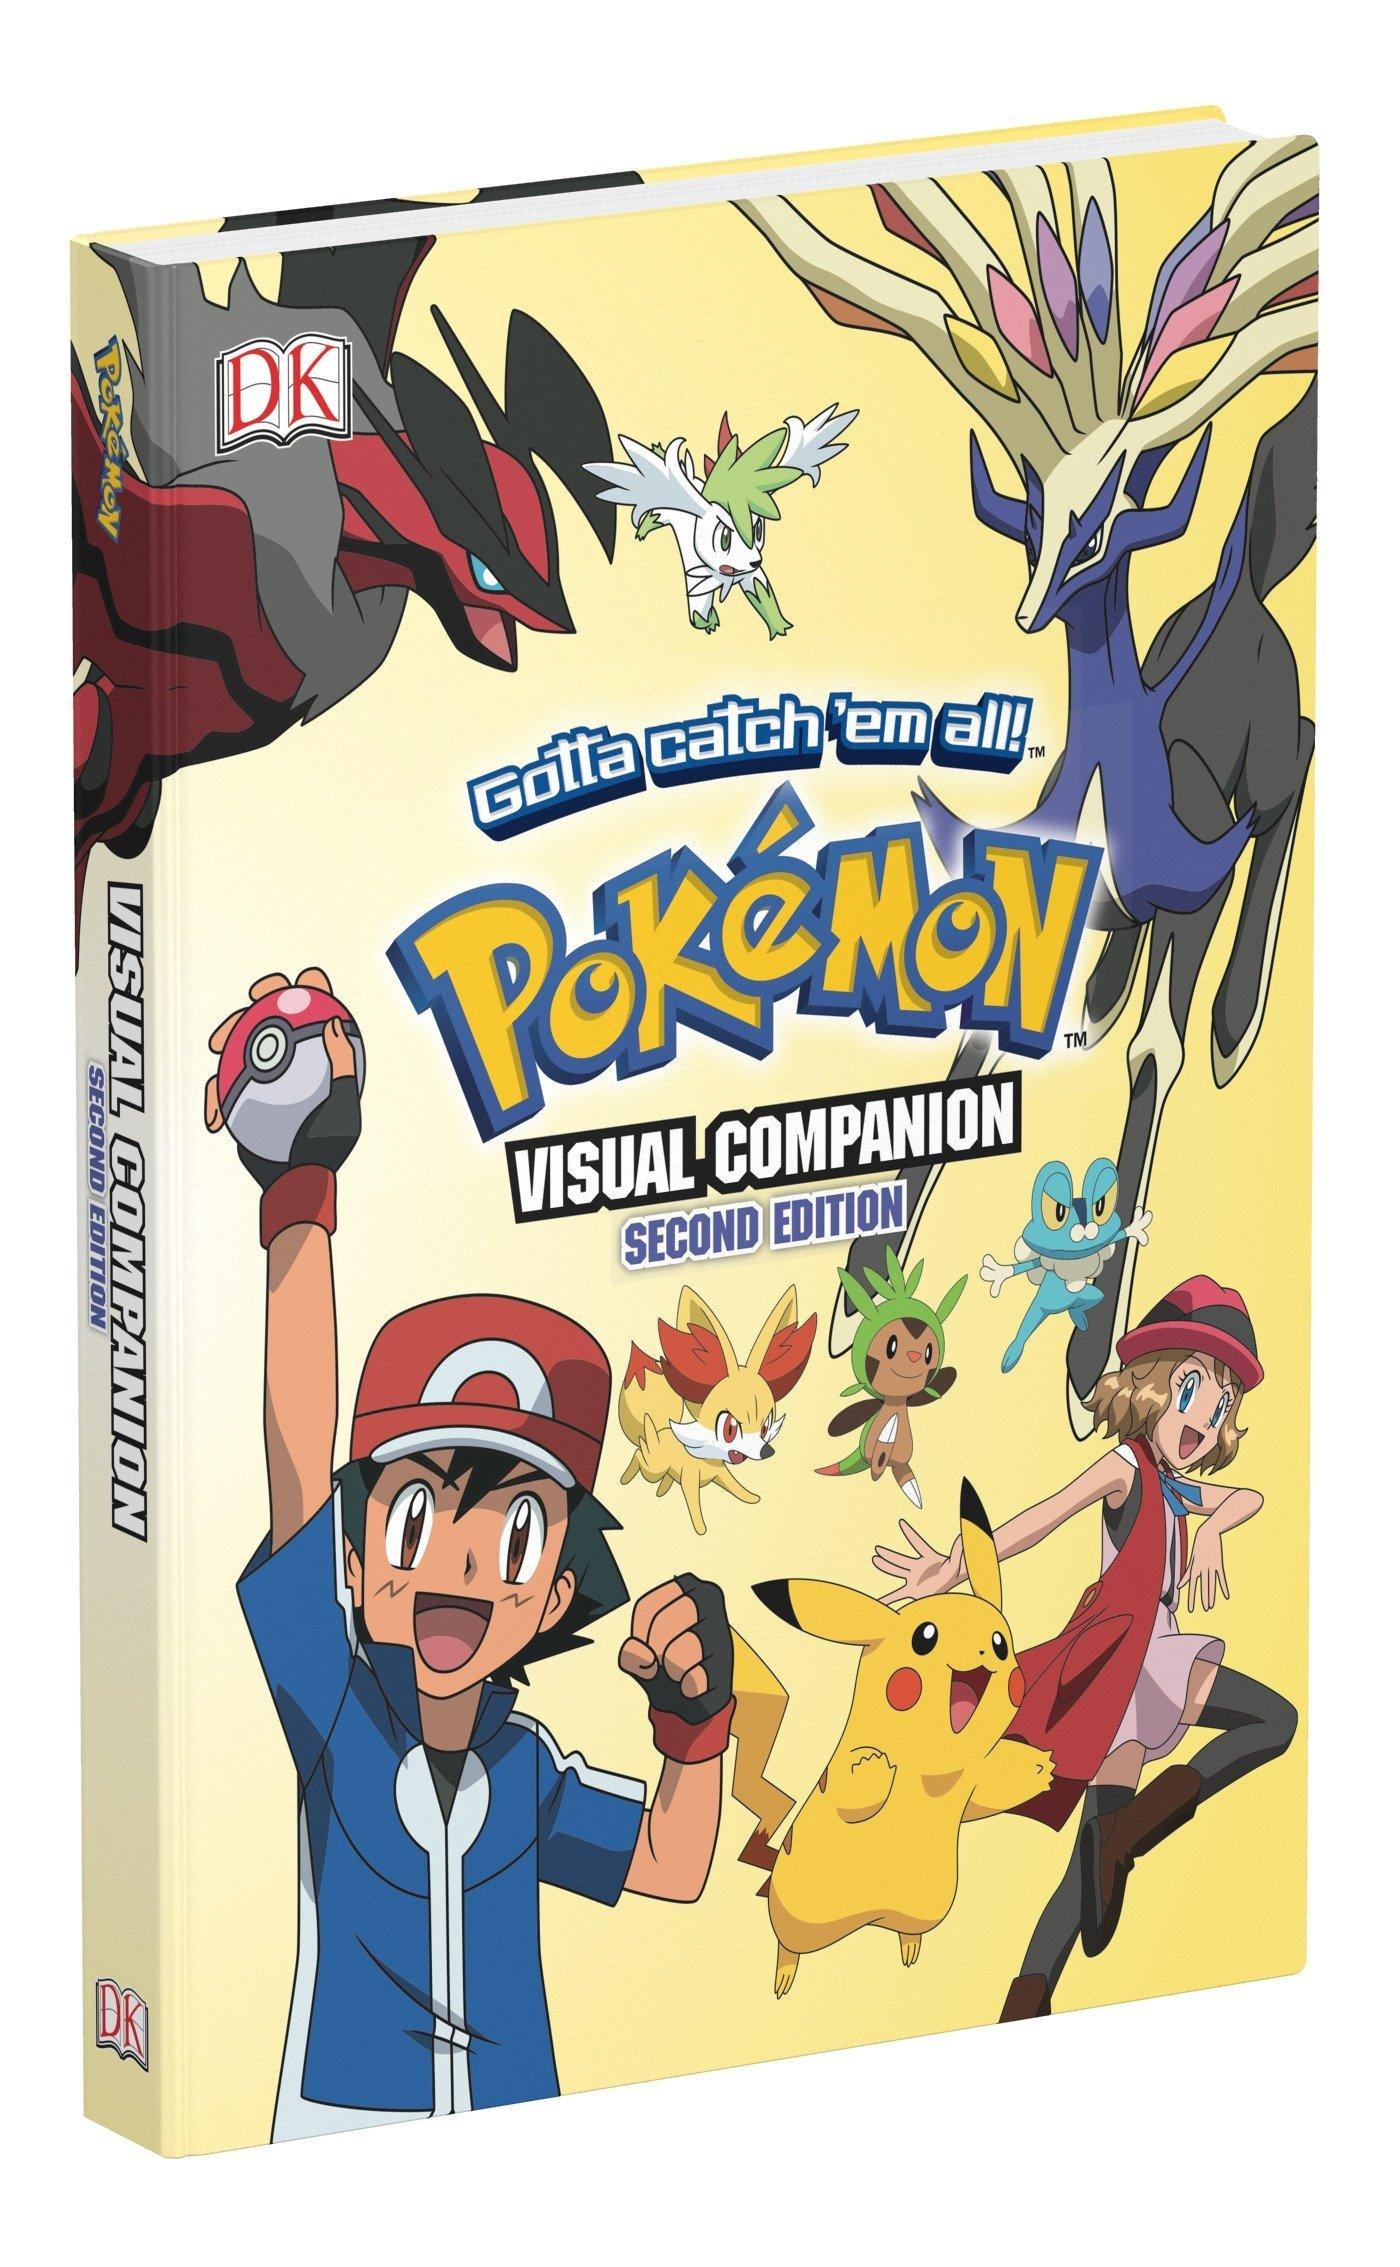 Pokémon Visual Companion, Second Edition Hardcover – November 15, 2016 BradyGames DK 0744017602 Pokaemon (Game)